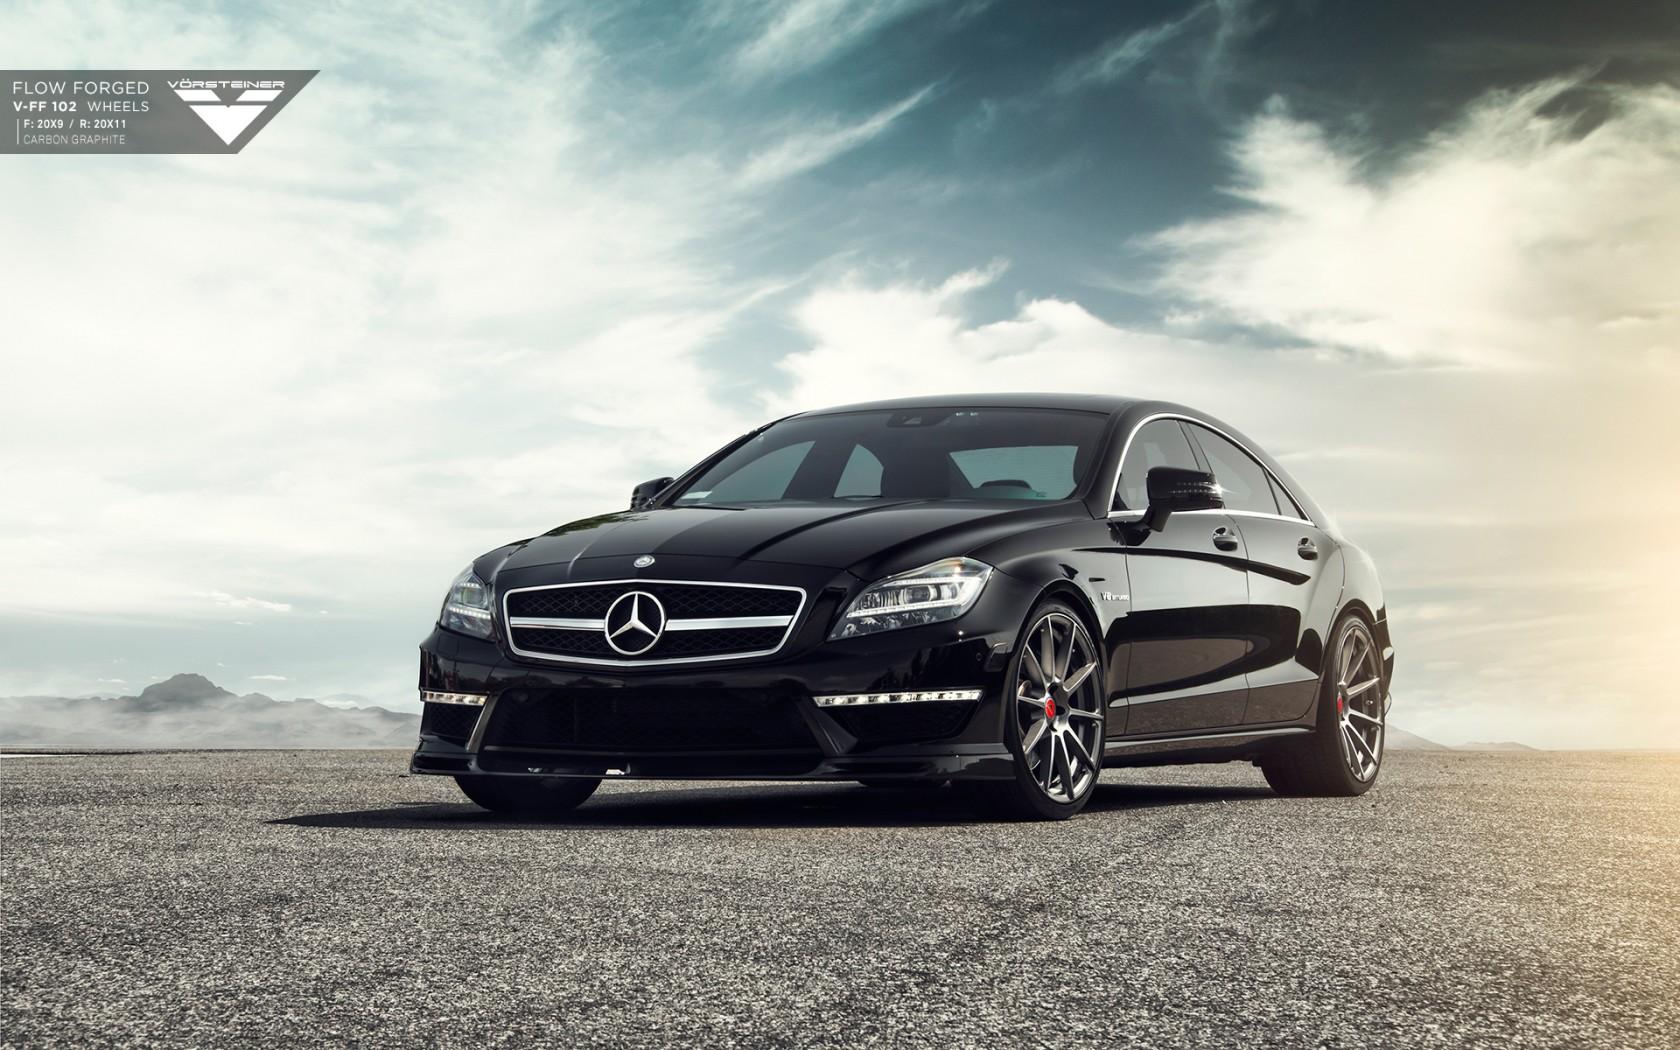 Bmw Wallpaper Iphone X Mercedes Benz Cls63 Amg Vorsteiner Wallpaper Hd Car